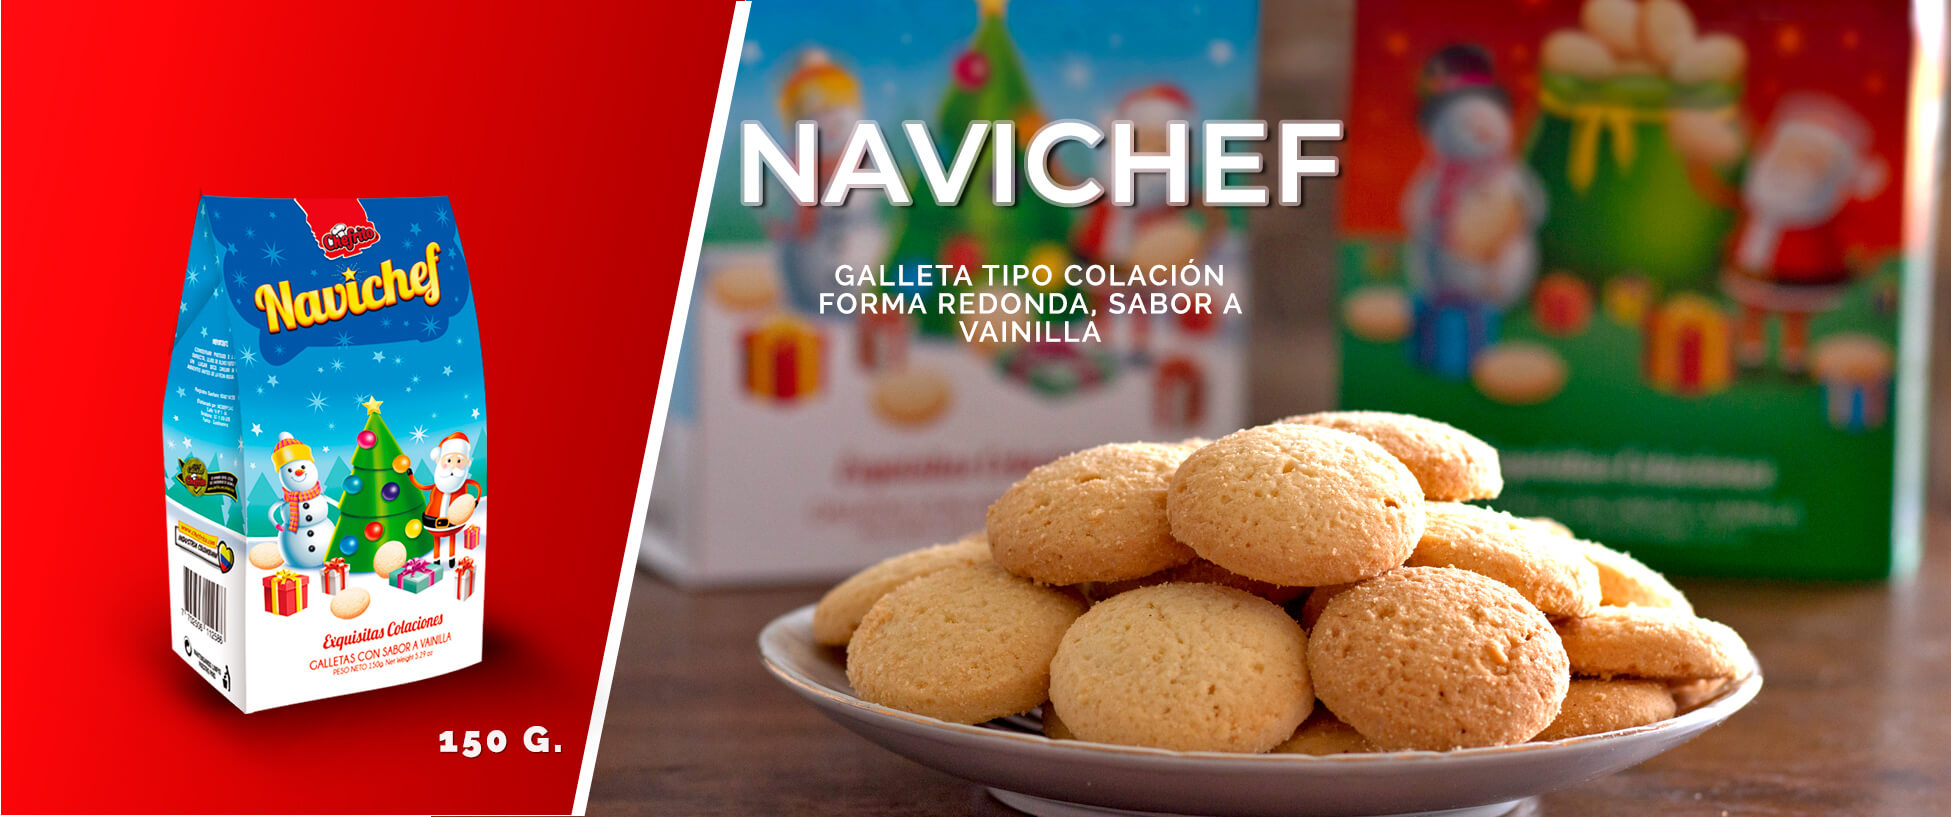 Navichef 1